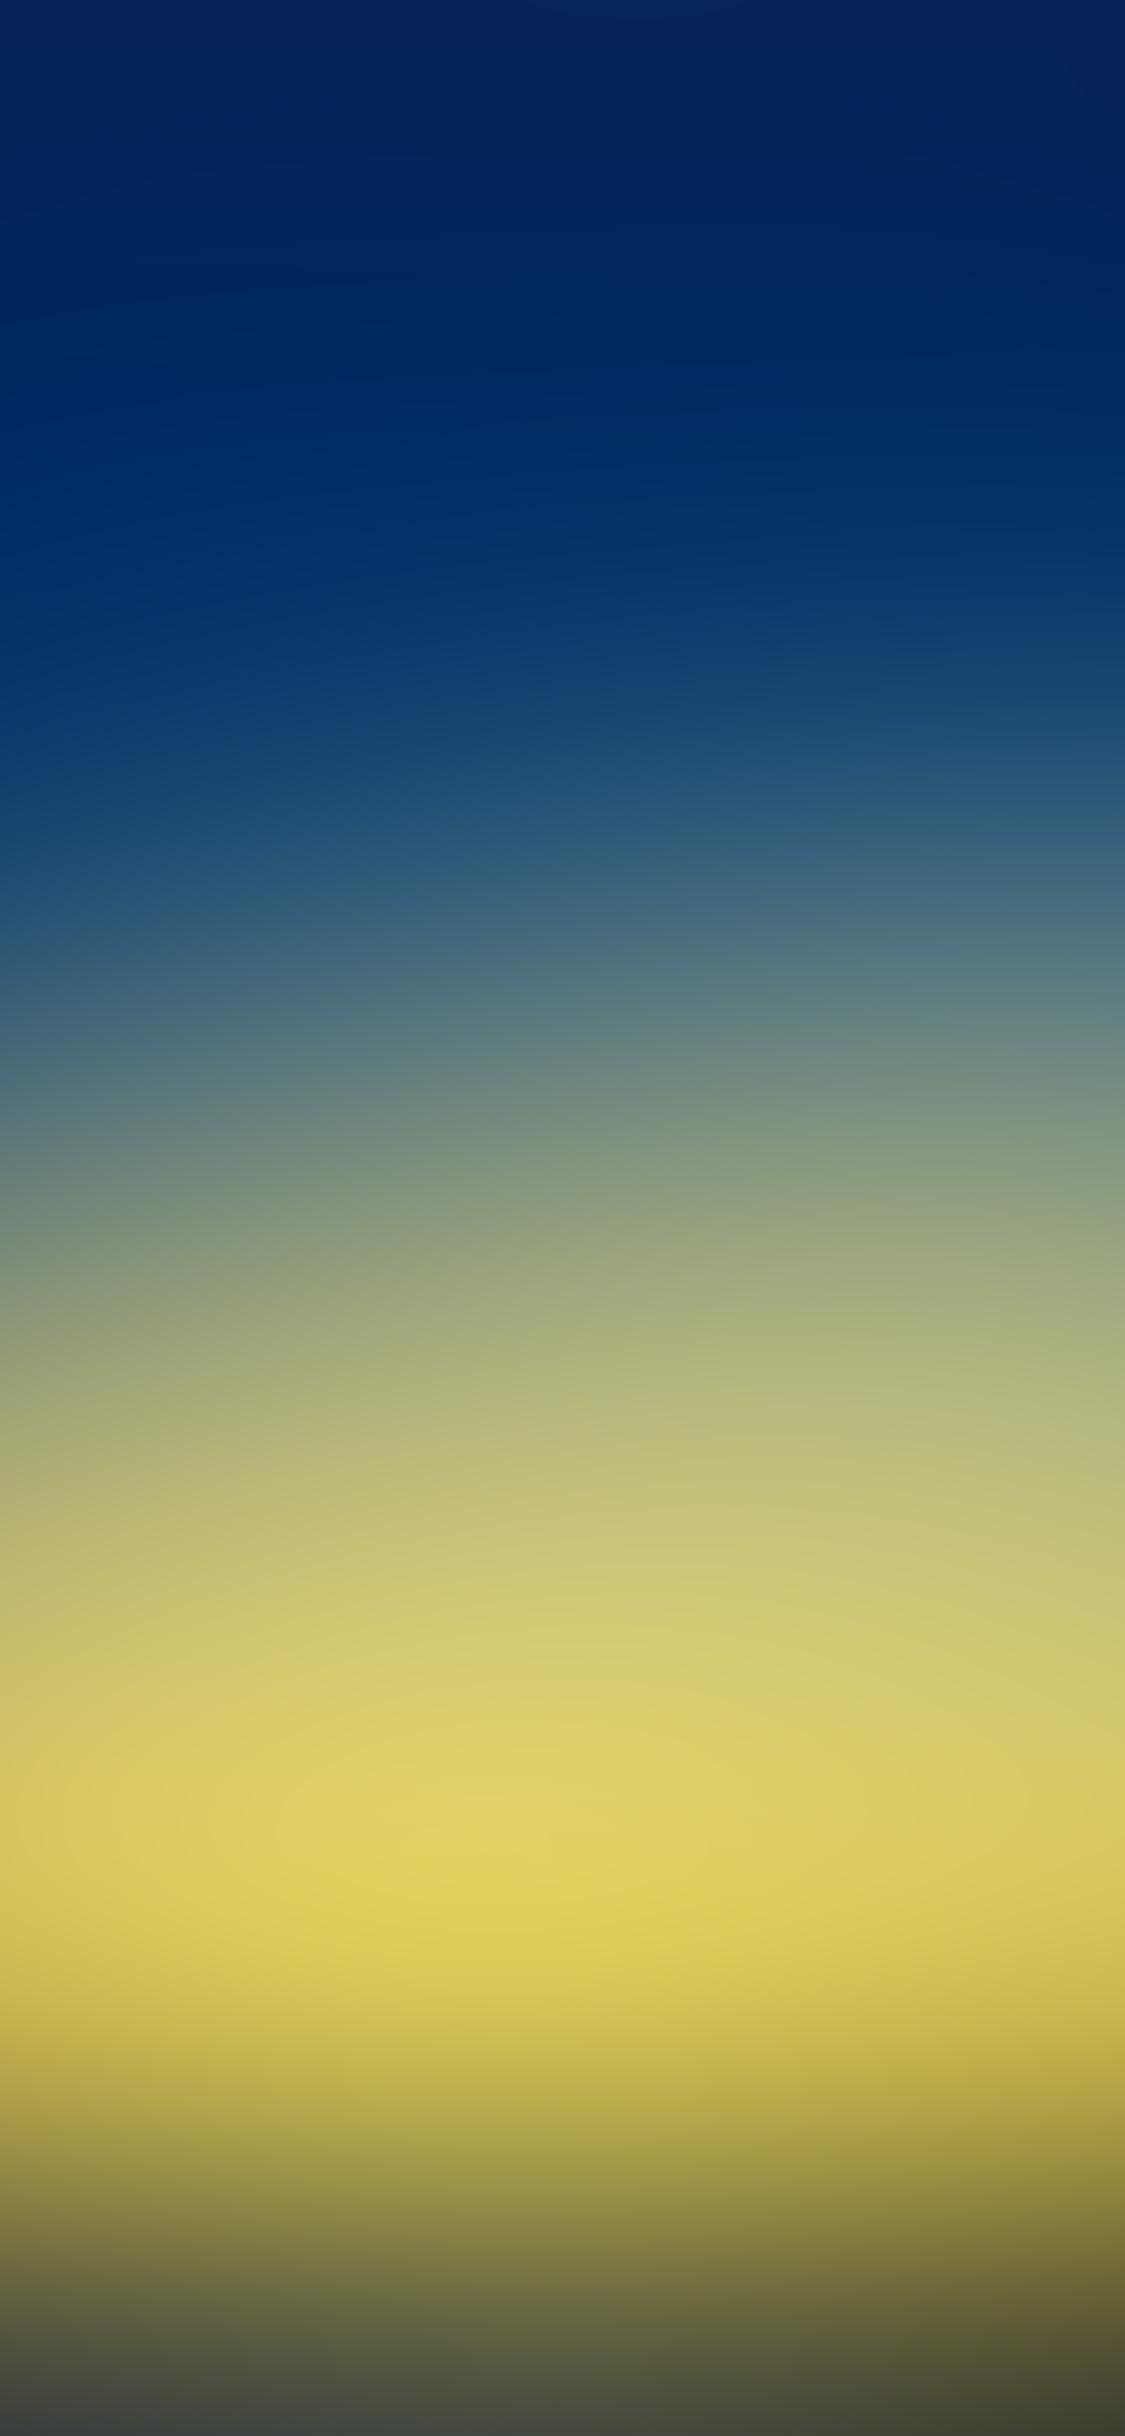 iPhonexpapers.com-Apple-iPhone-wallpaper-sm53-blue-sky-blur-gradation